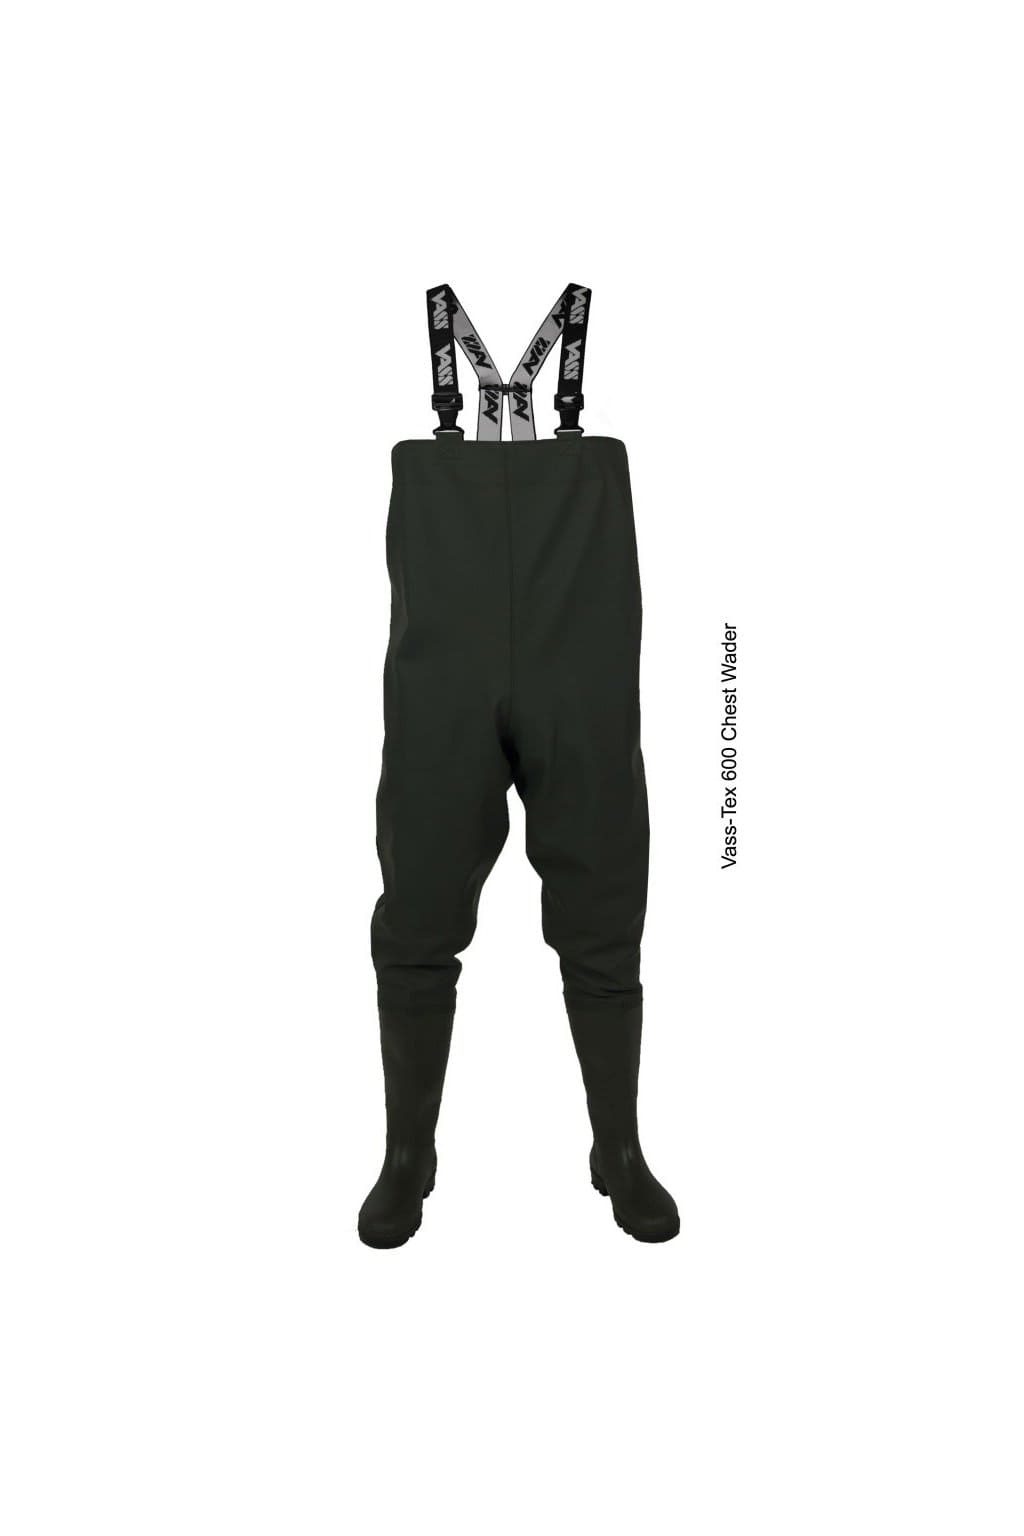 Prsačky (brodící kalhoty) Vass-Tex 600 series